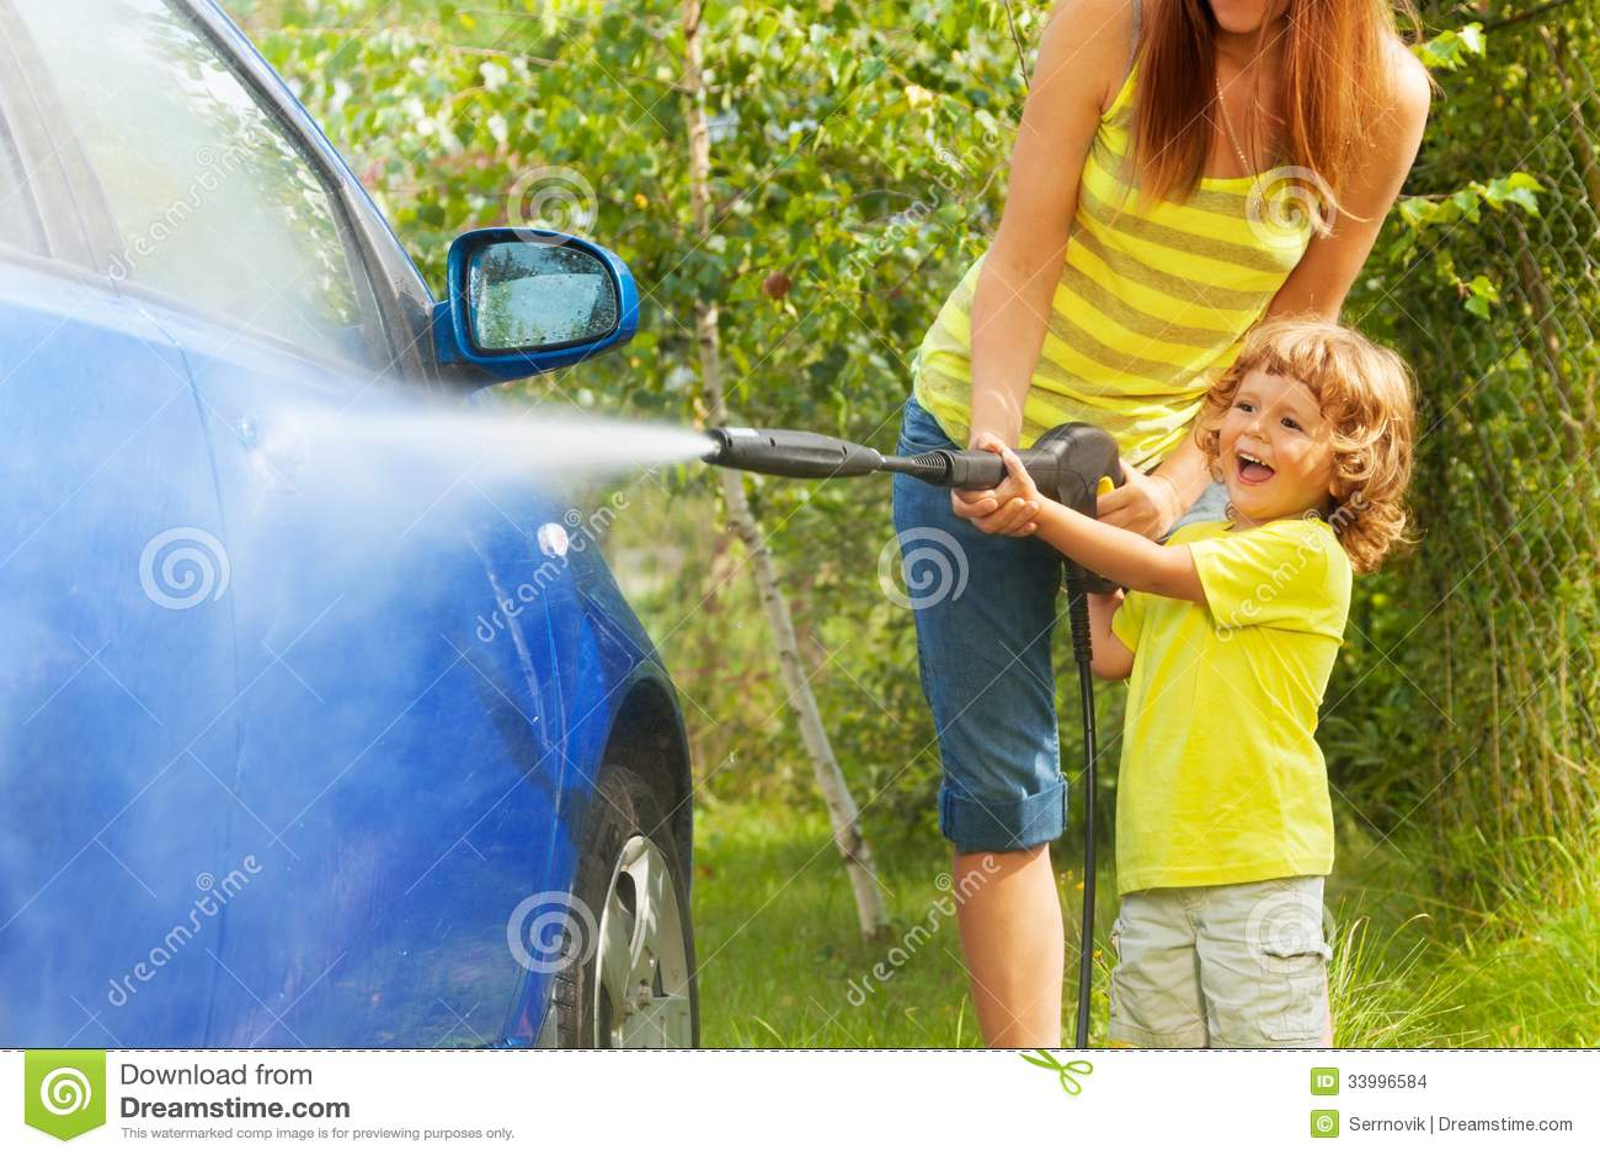 Washing Car On Grass